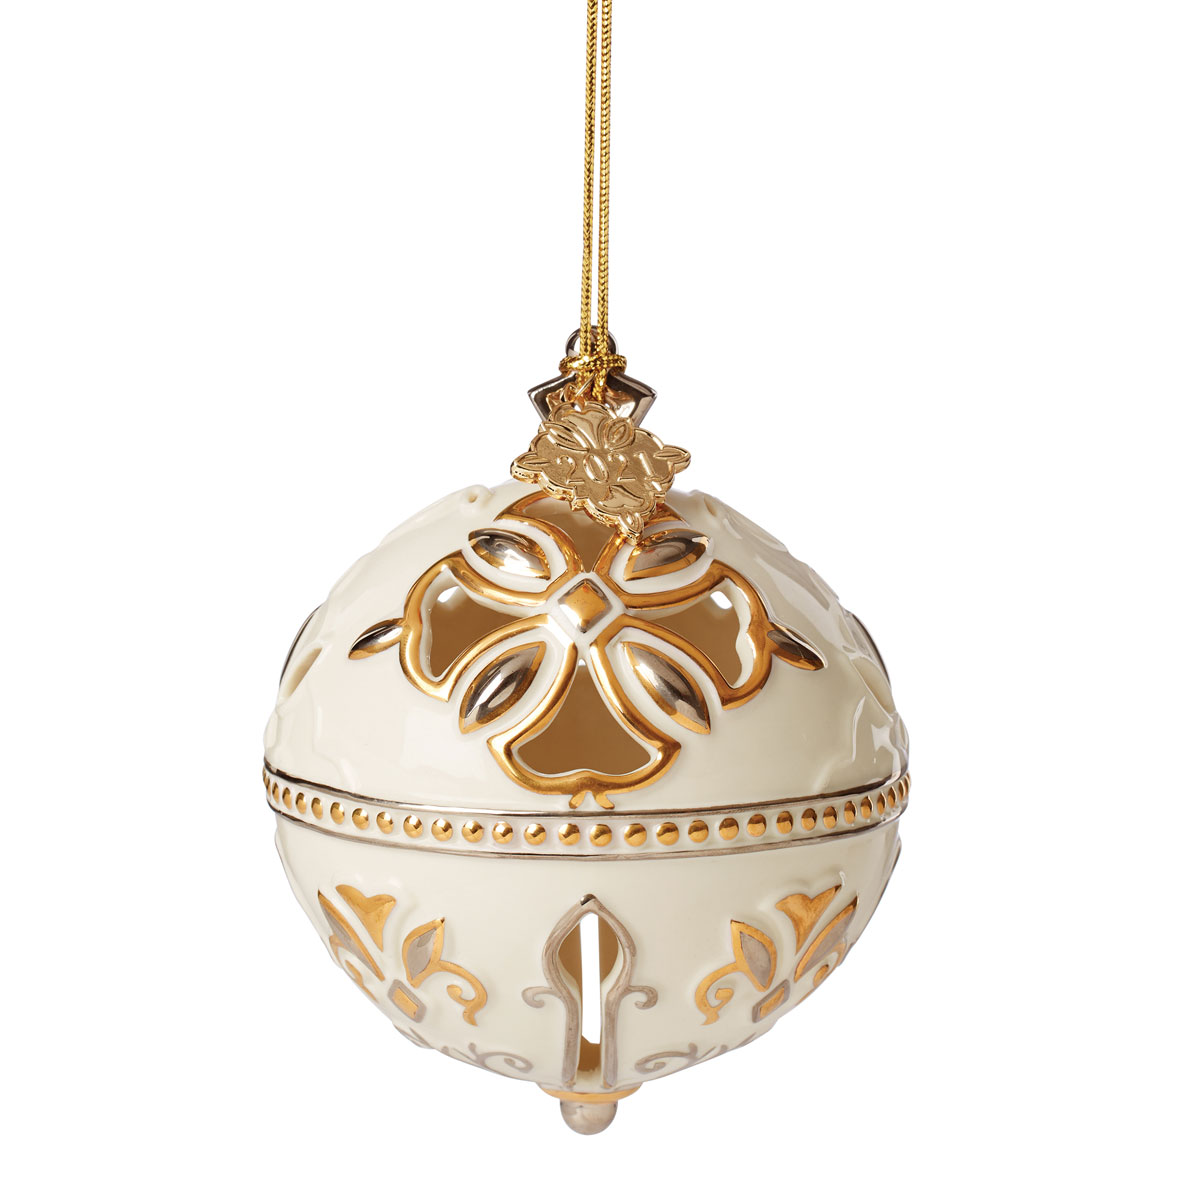 Lenox 2021 Annual Ornament - Jingle Bell